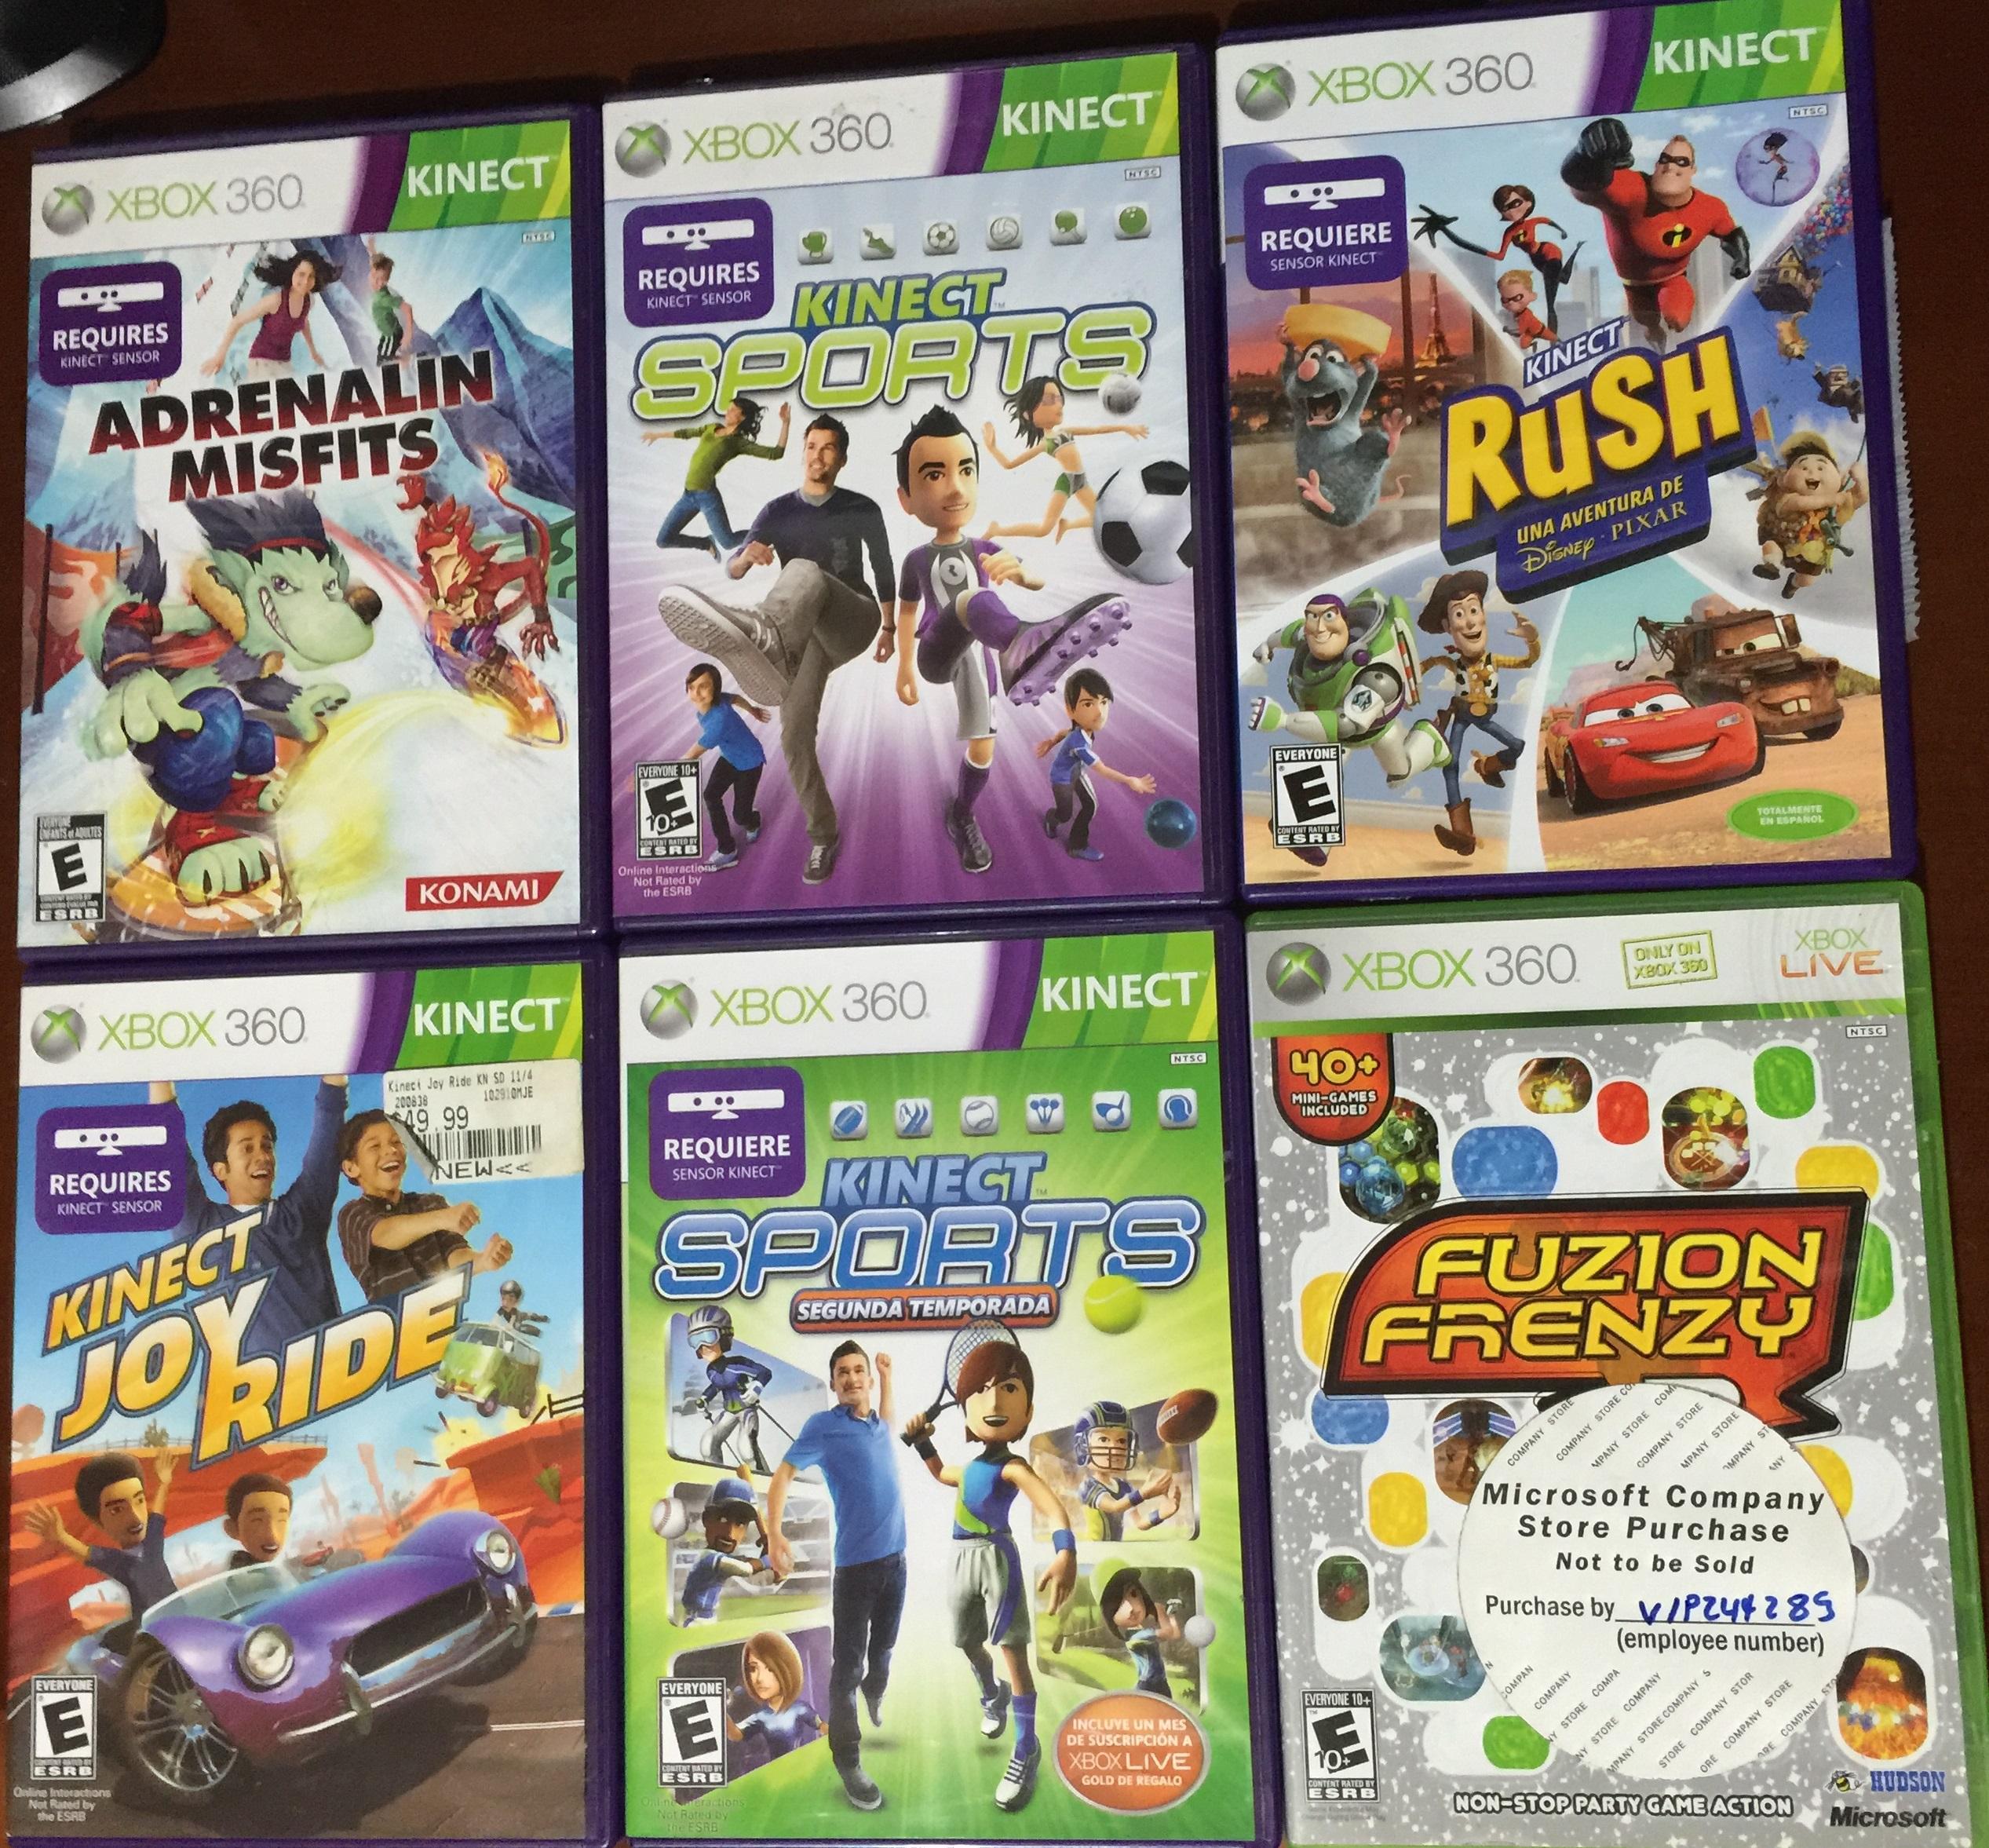 08 Xbox 360 Kinect.JPG